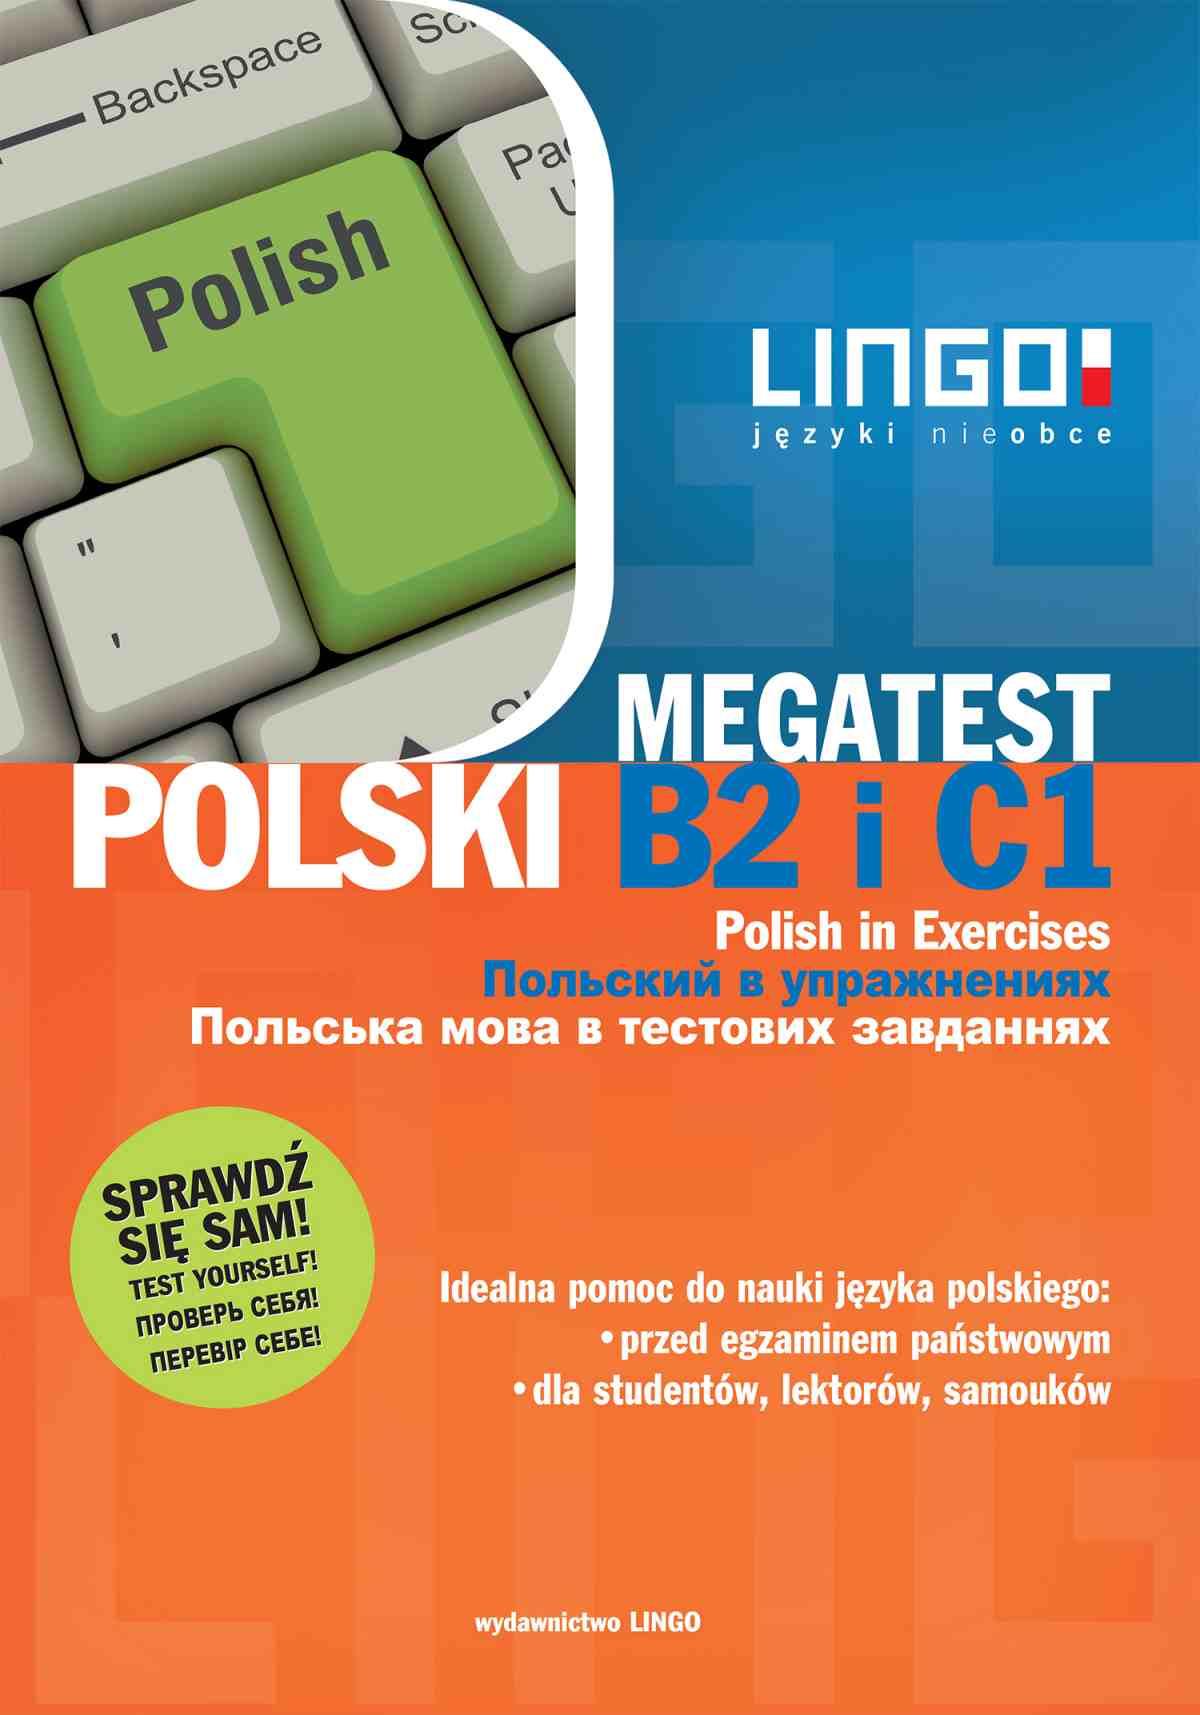 Polski B2 i C1. Megatest. Polish B2 and C1 in Exercises - Ebook (Książka PDF) do pobrania w formacie PDF